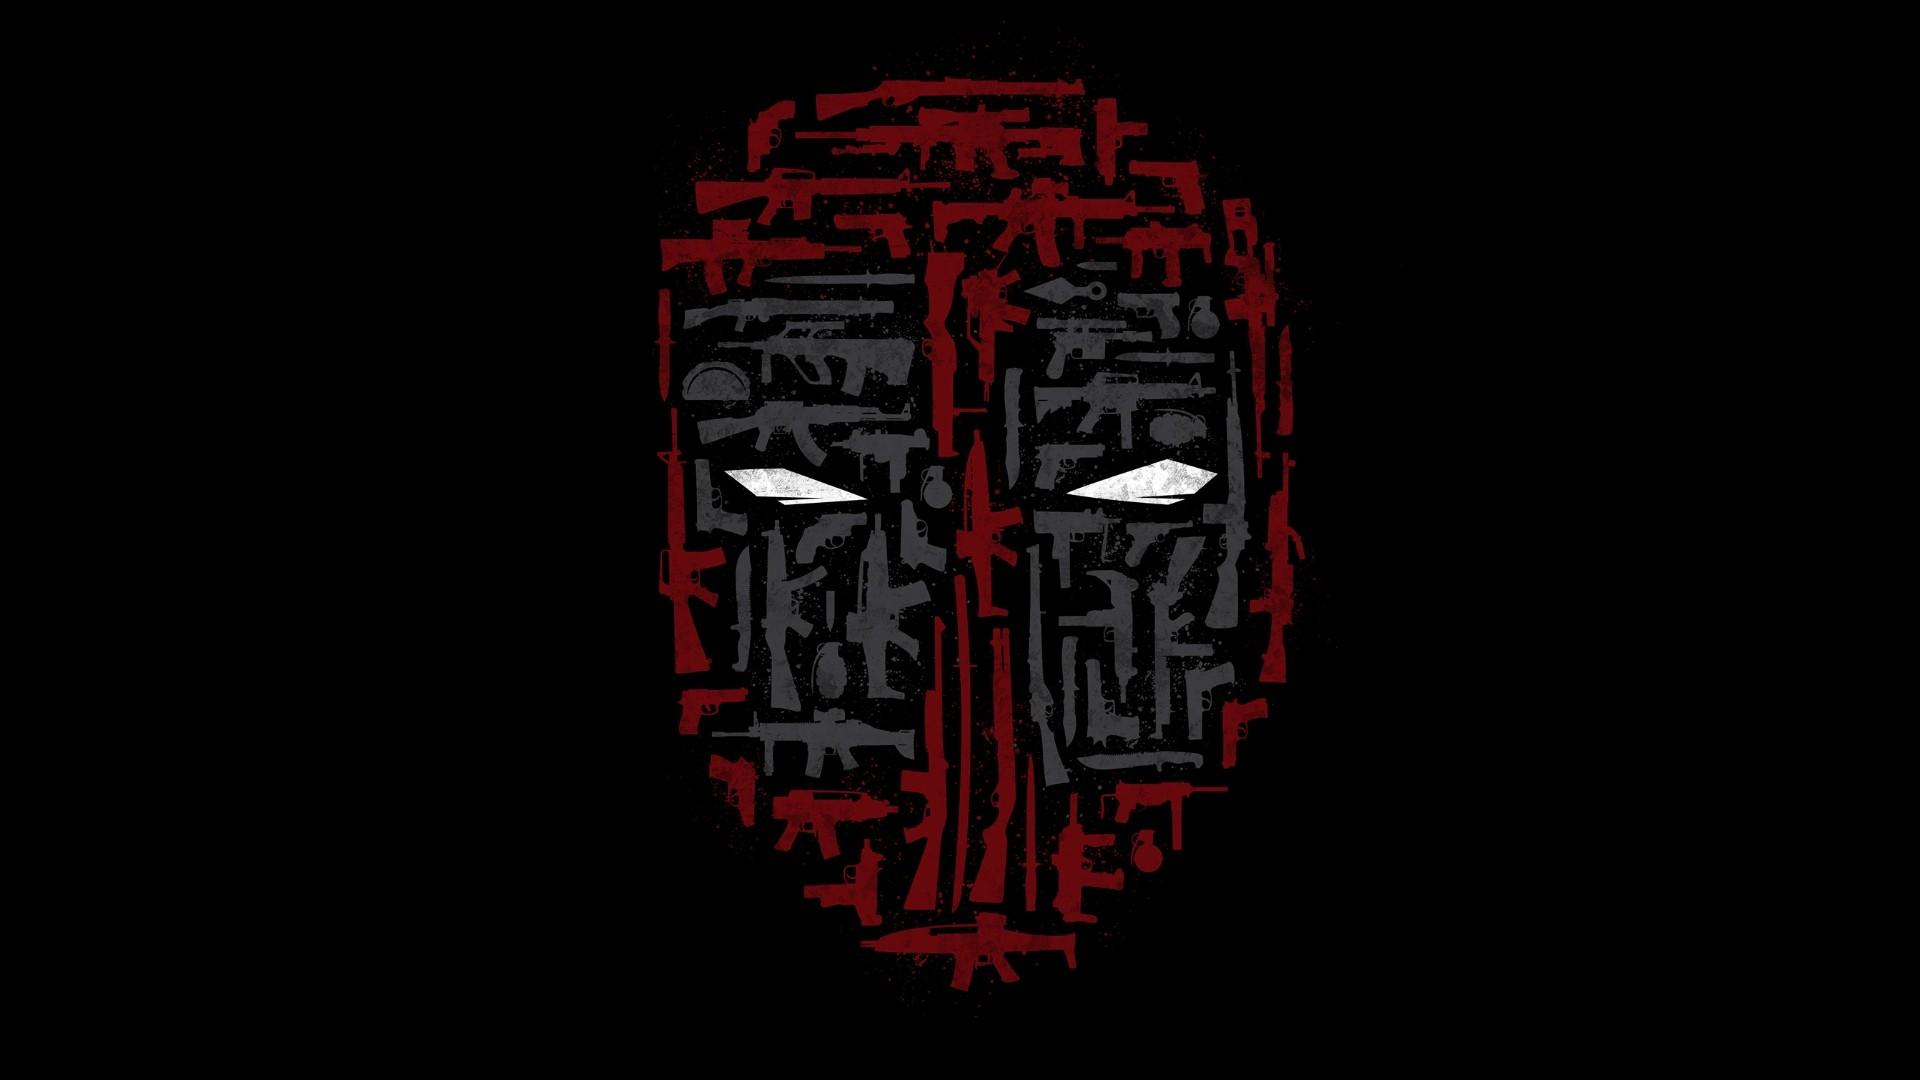 Amazing Wallpaper Logo Collage - illustration-minimalism-collage-weapon-mask-text-logo-Deadpool-symbol-number-human-body-font-organ-71083  Photograph_624334.jpg